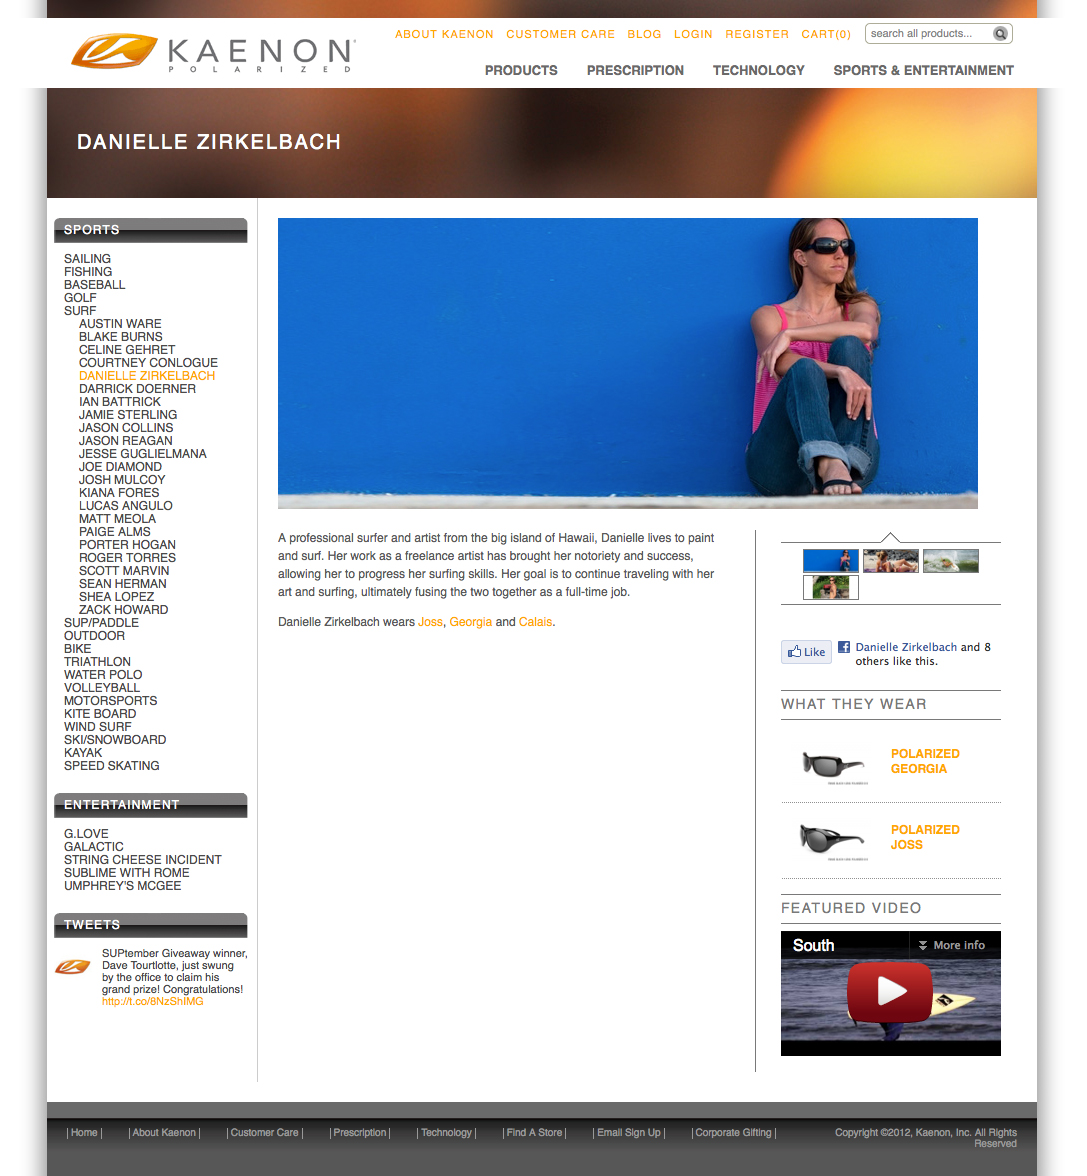 2012-05-01-danielle-zirkelback-kaenon.com-web-9th-wave-gallery.jpg